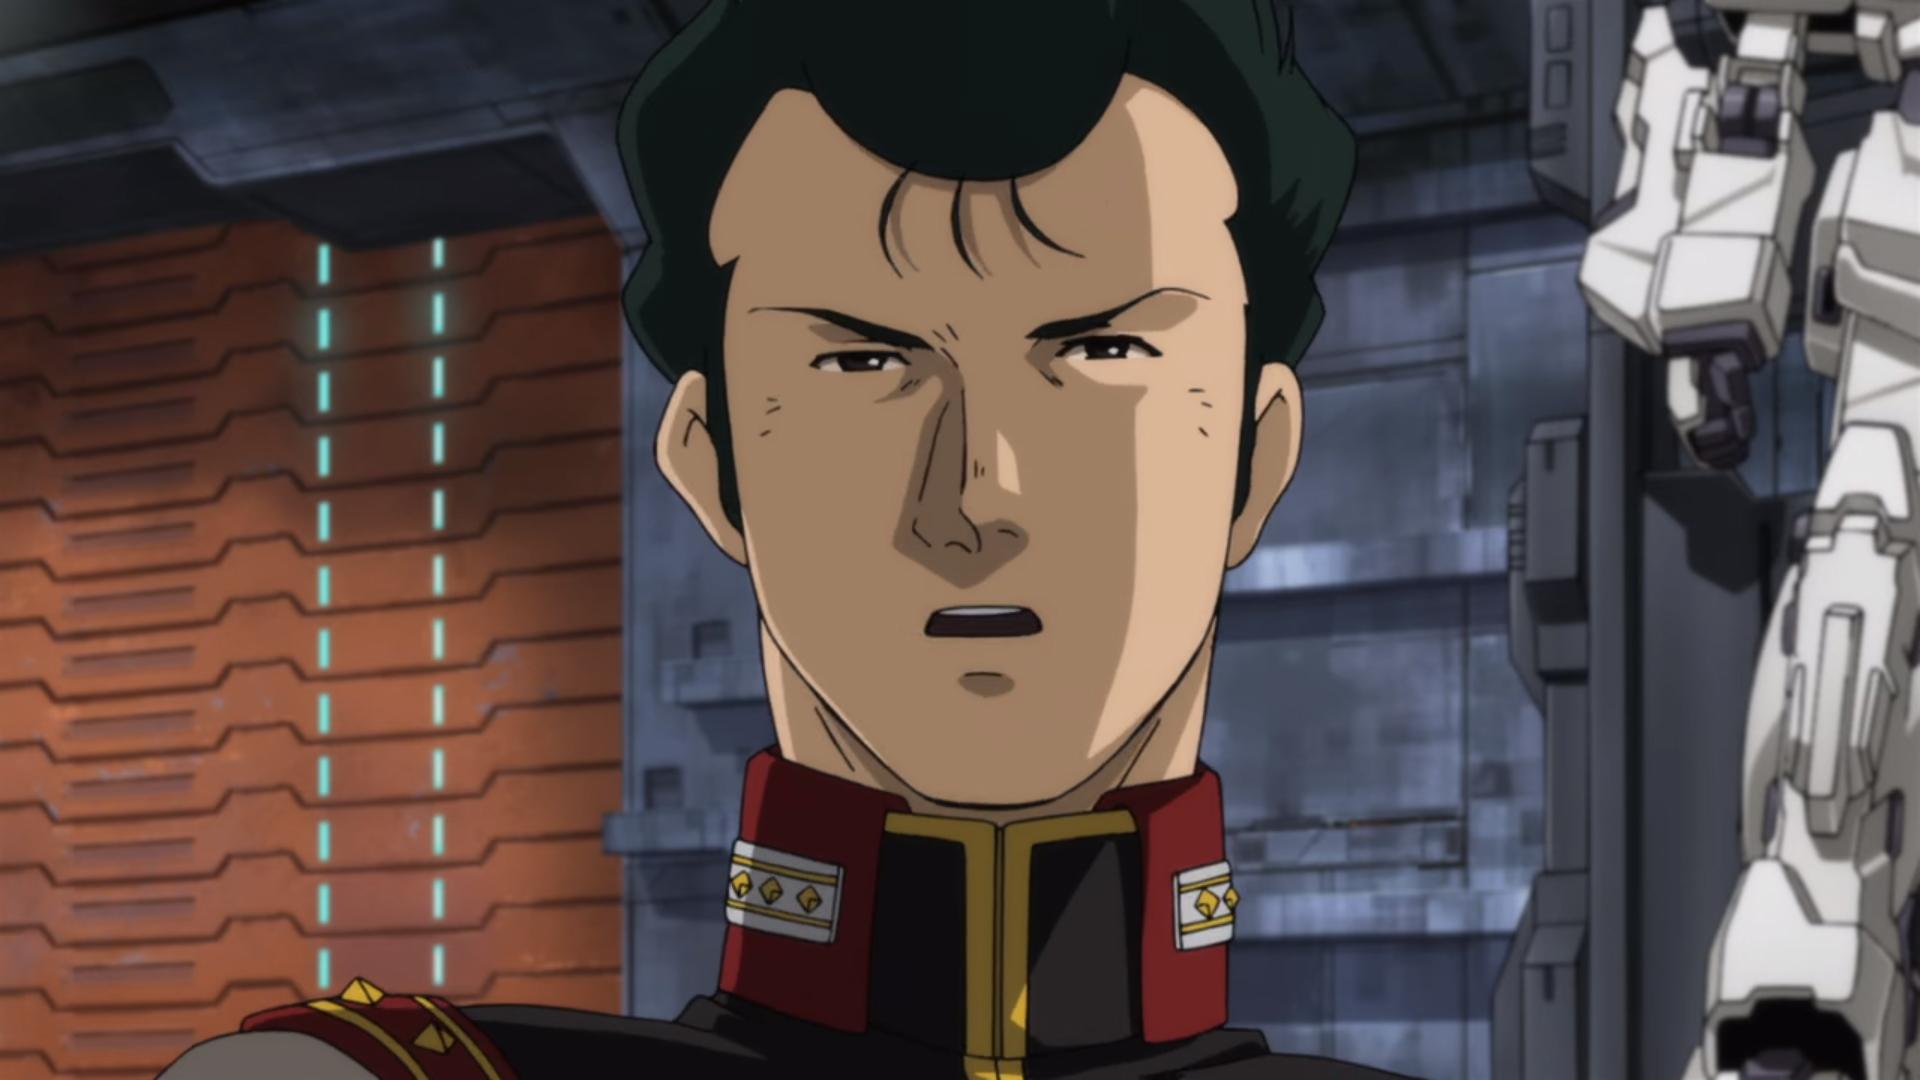 Crítica do Mobile Suit Gundam Unicorn 3